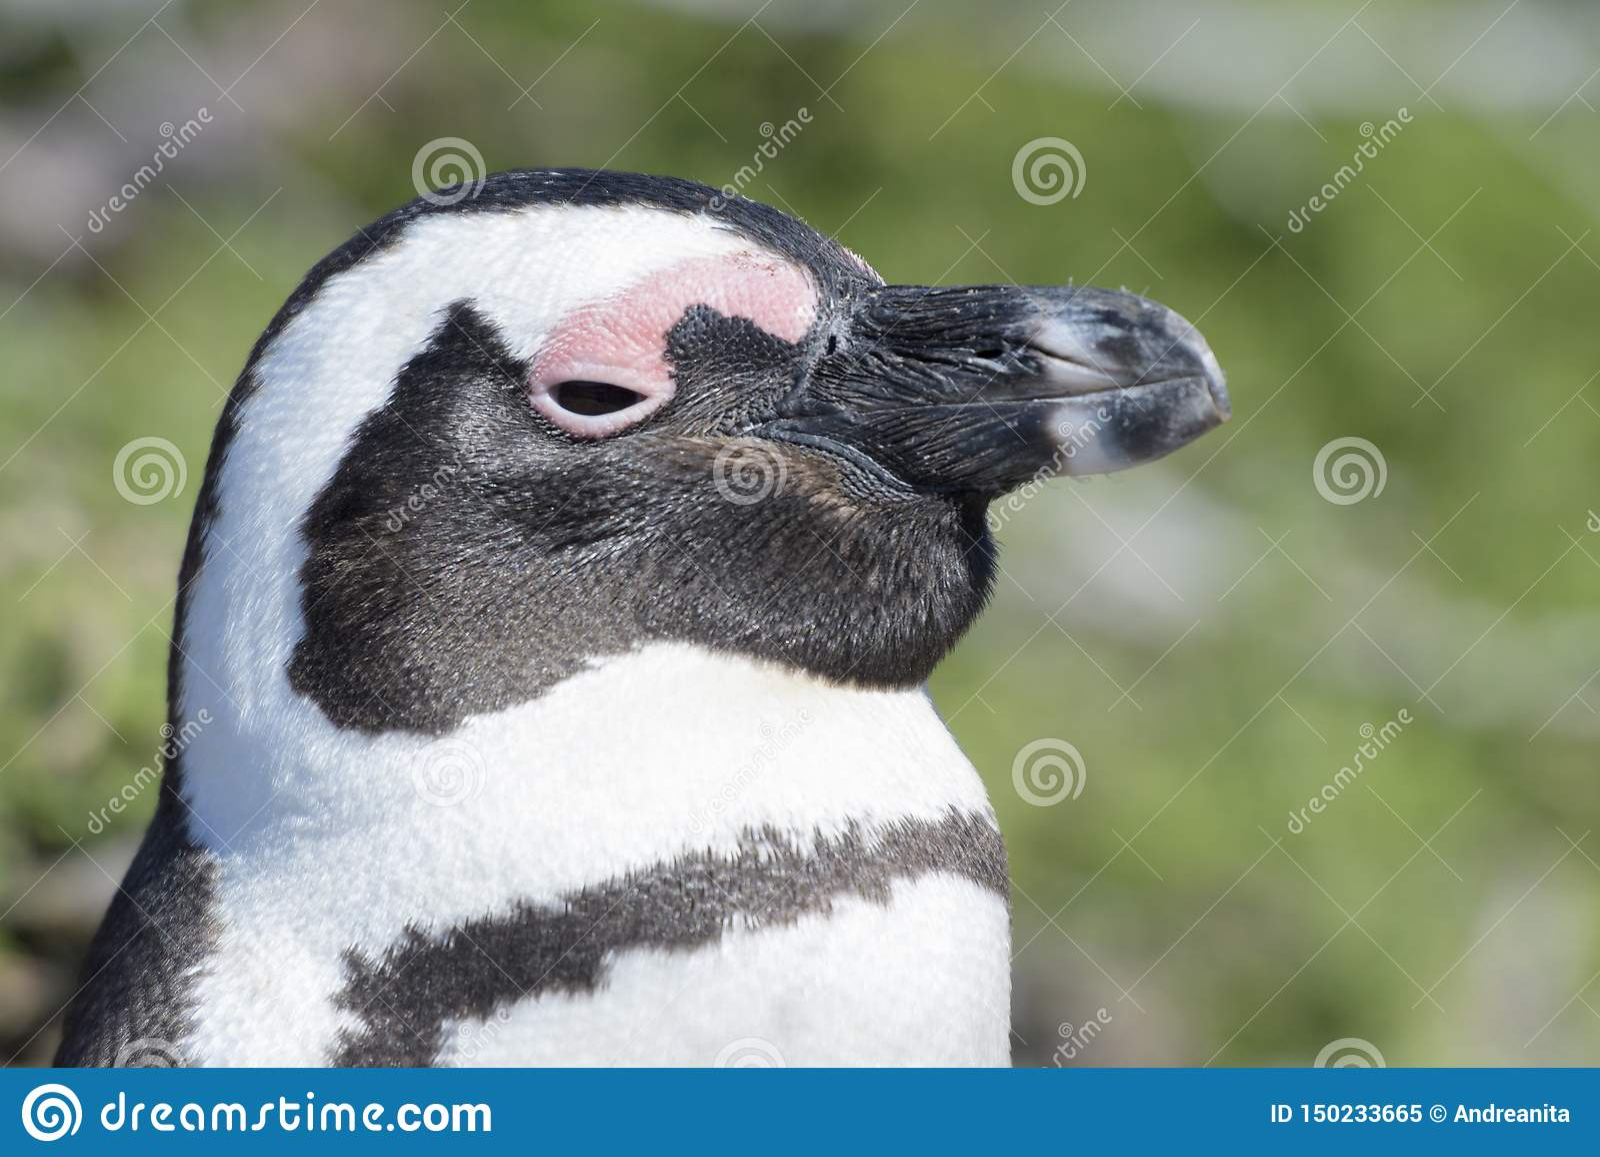 African penguin portrait, side view